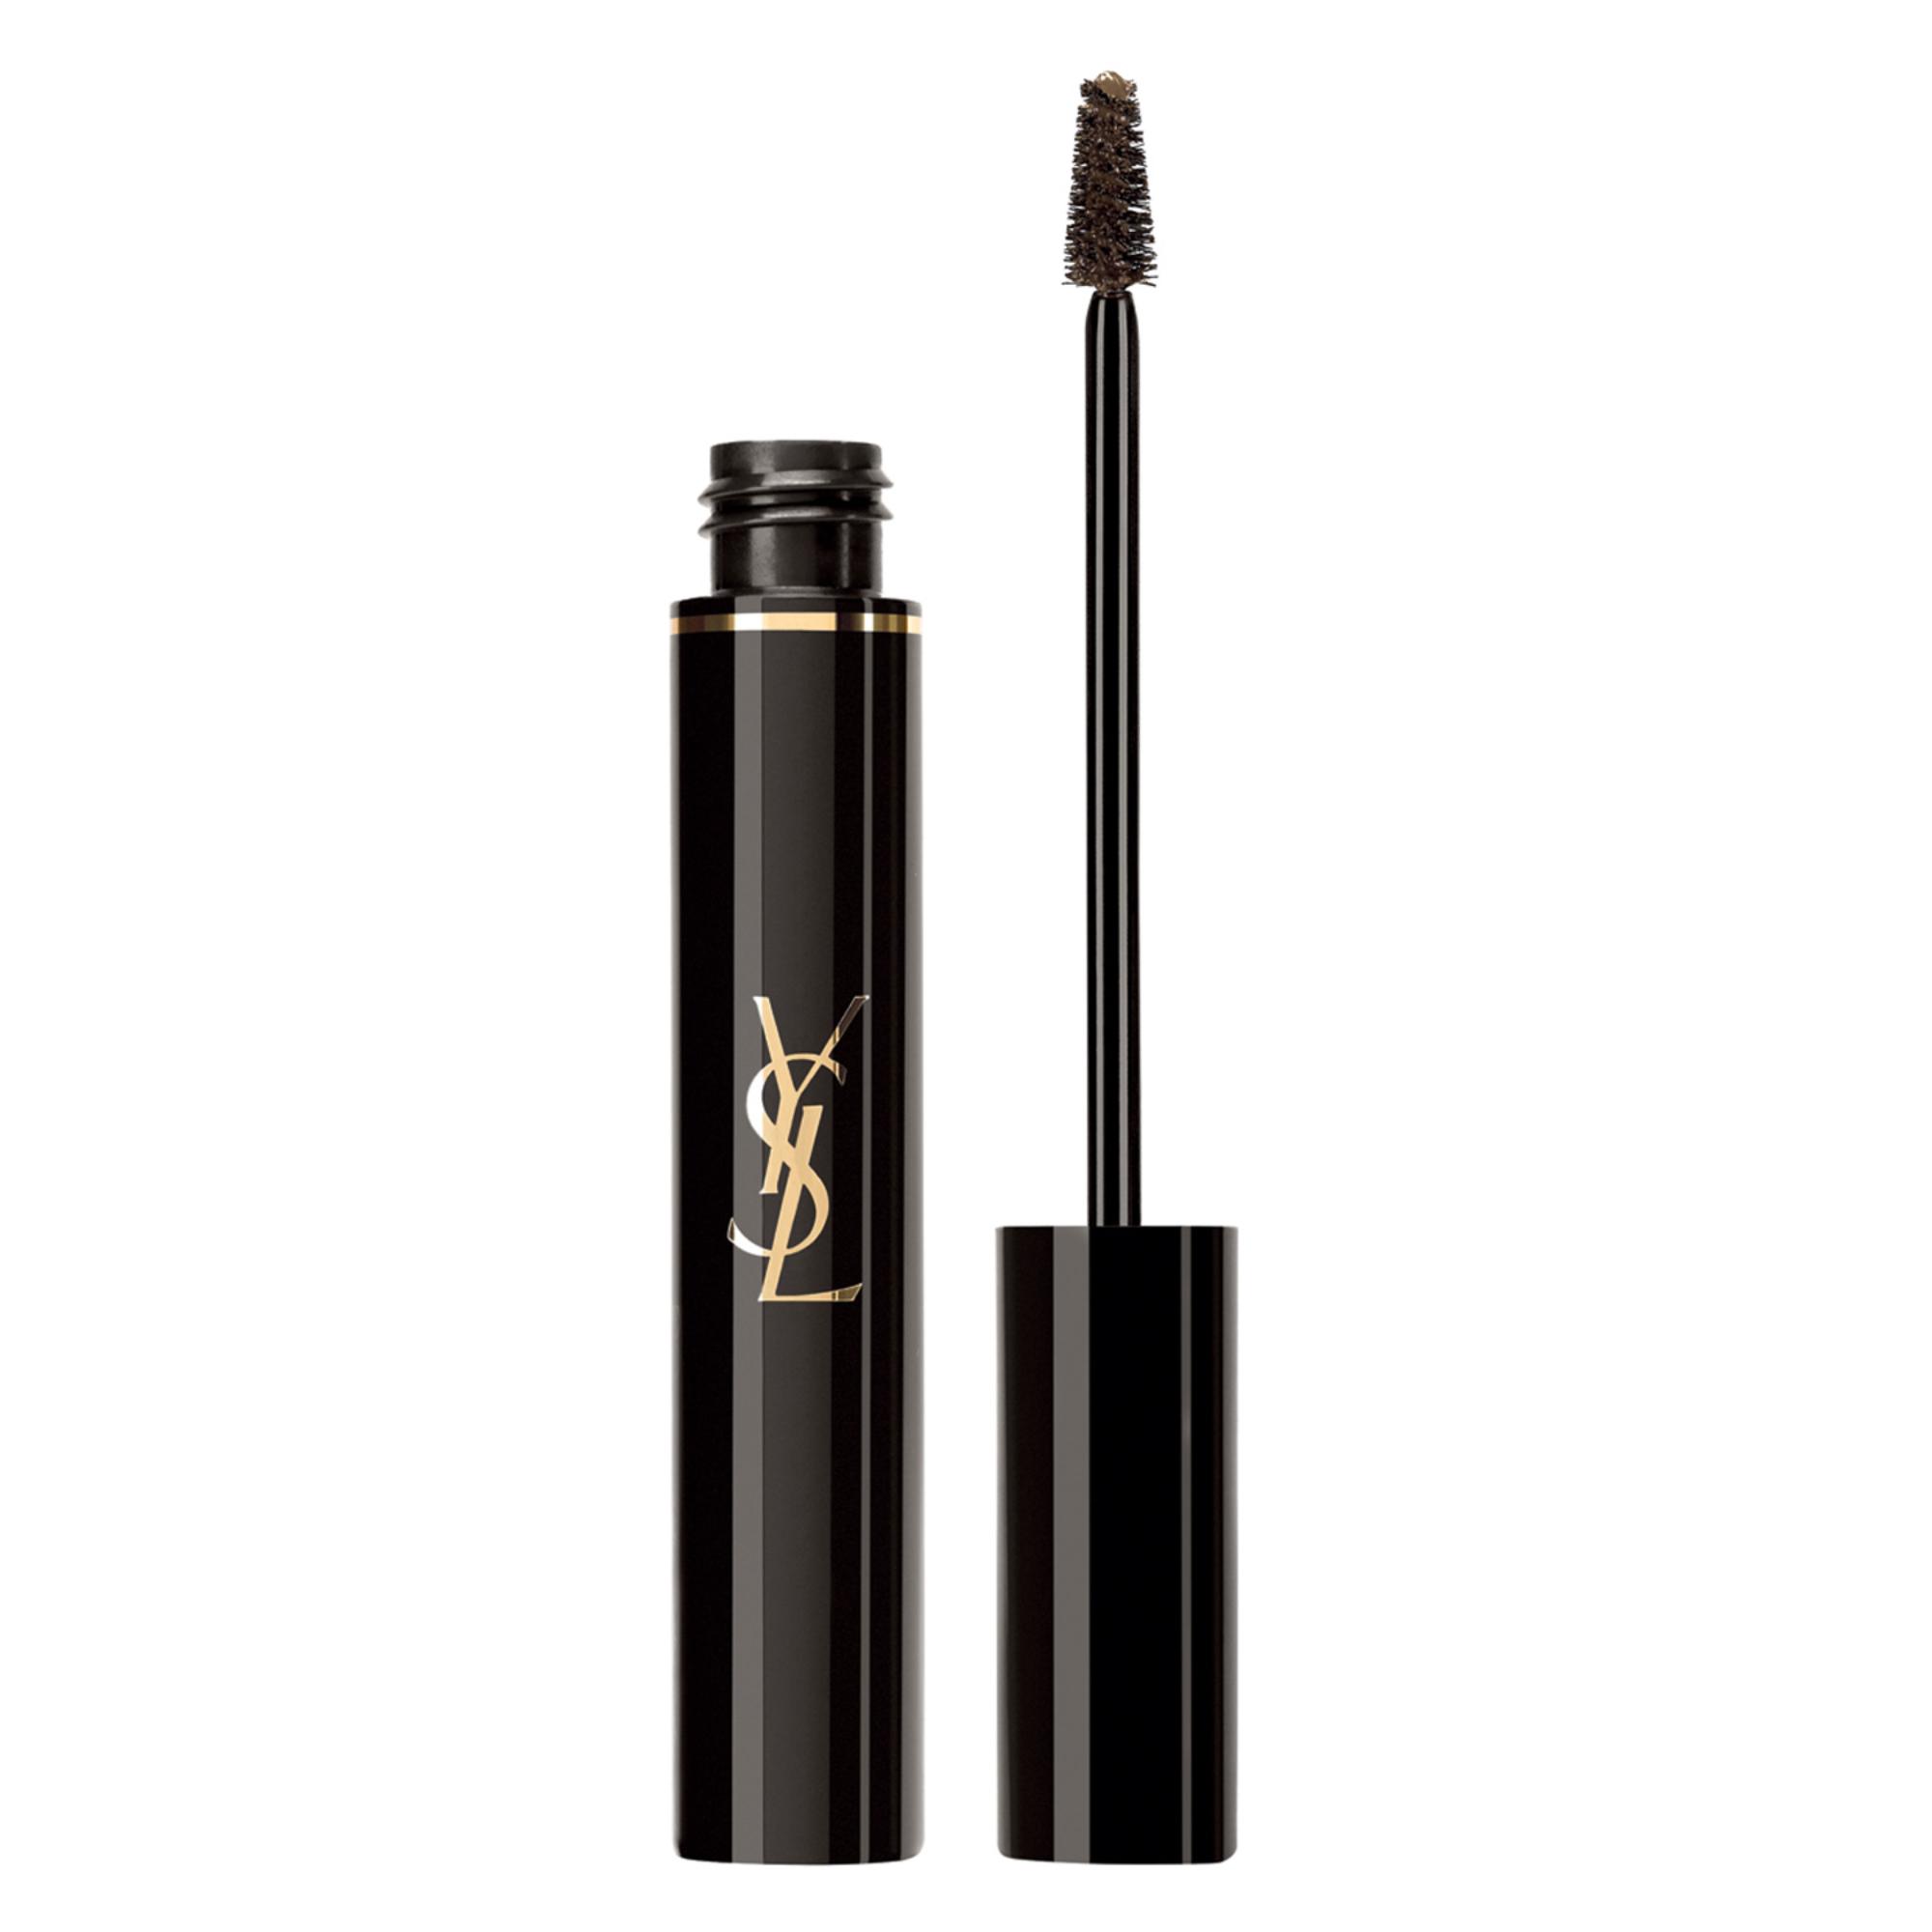 Yves Saint Laurent Couture Brow Mascara, 01 ash brown